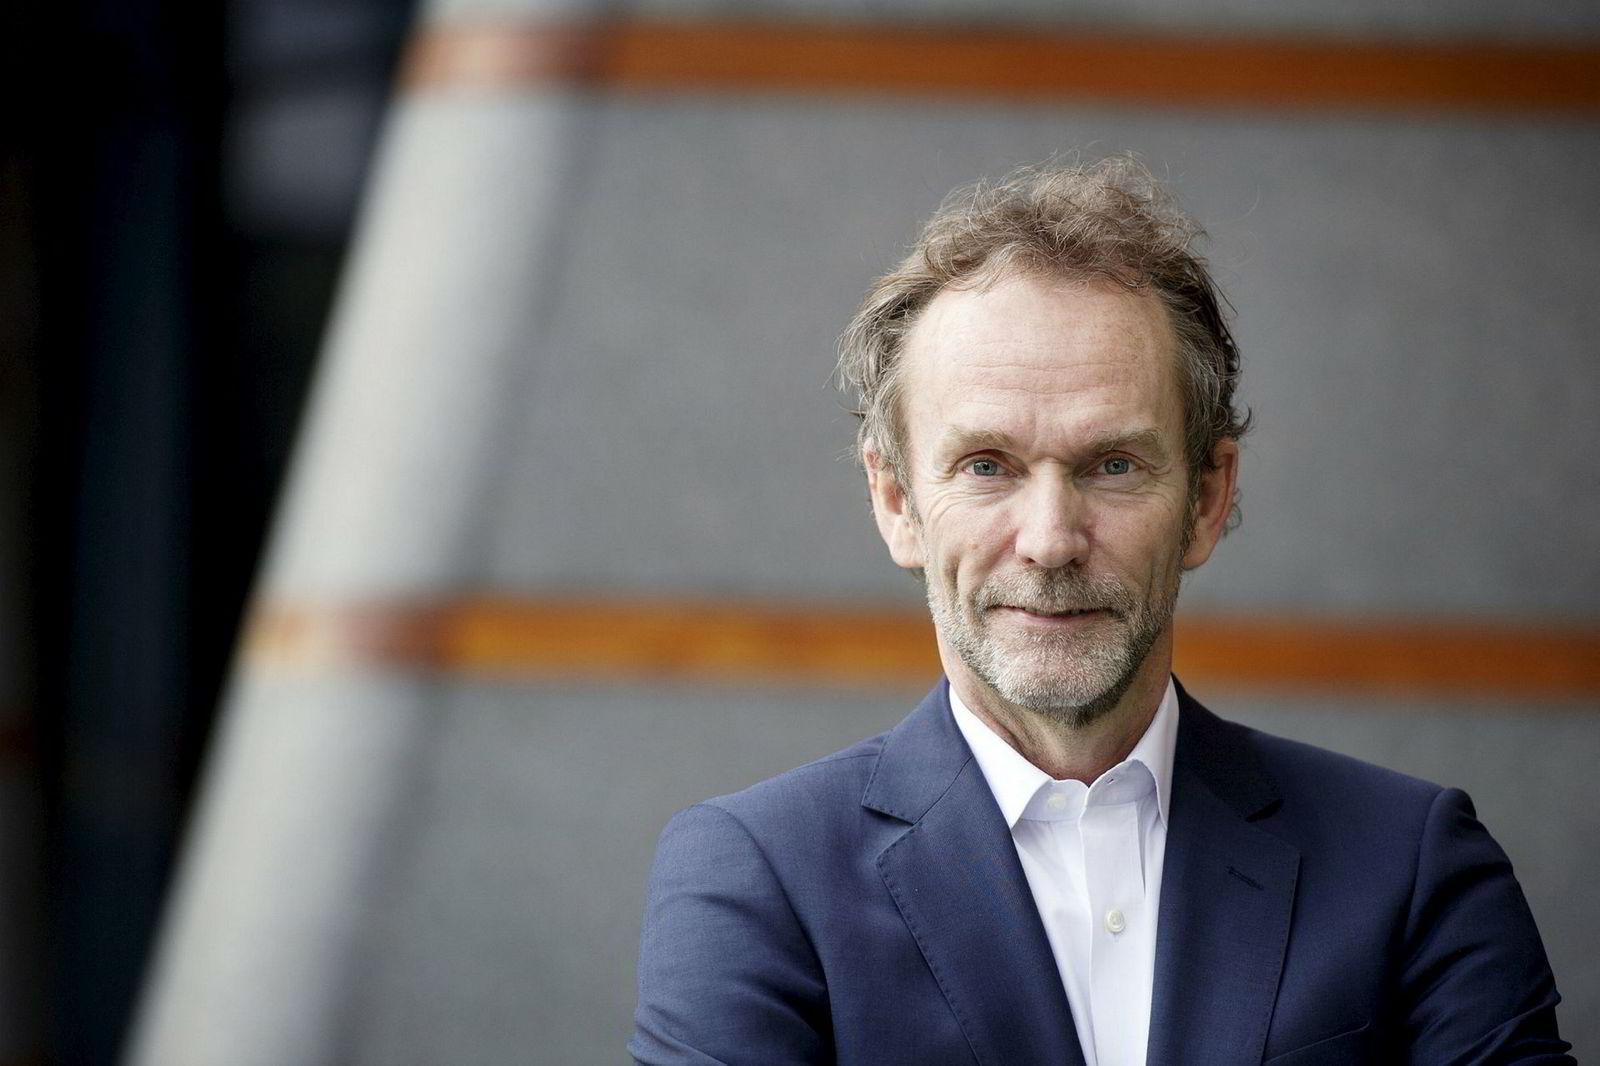 Sjeføkonom Harald Magnus Andreassen i Swedbank mener det ikke er akutt behov for stimulans i økonomien.